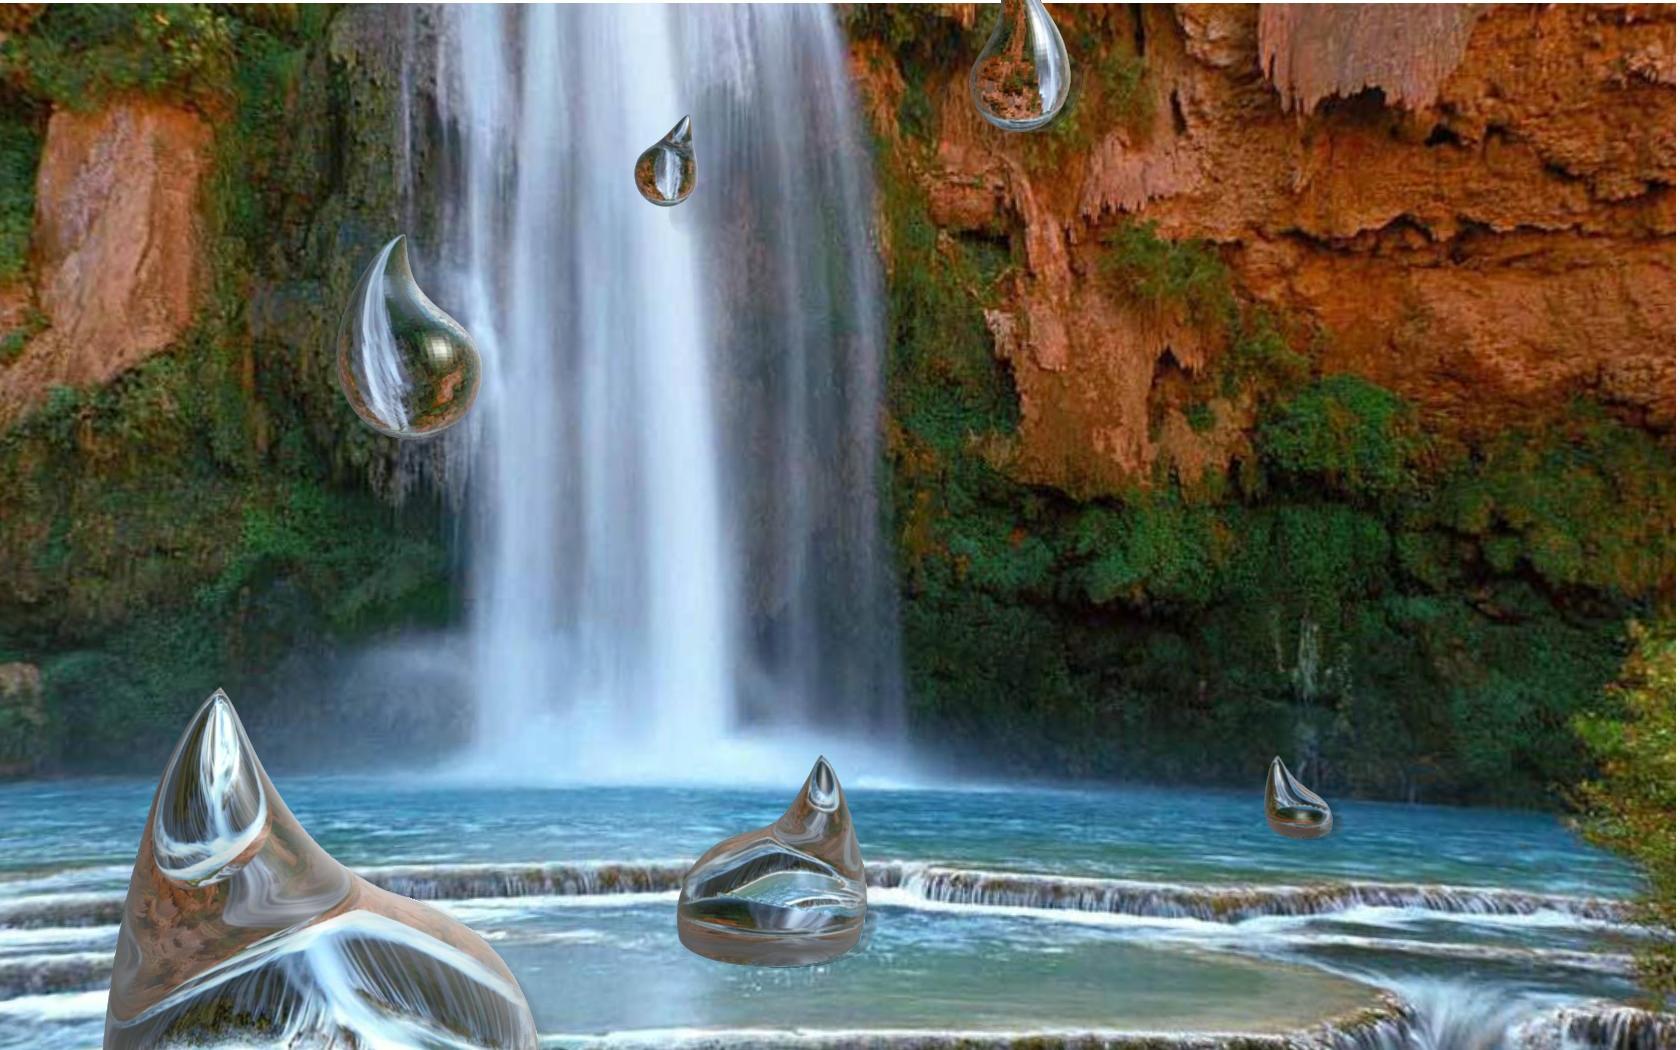 Floatin Drops by mugginz